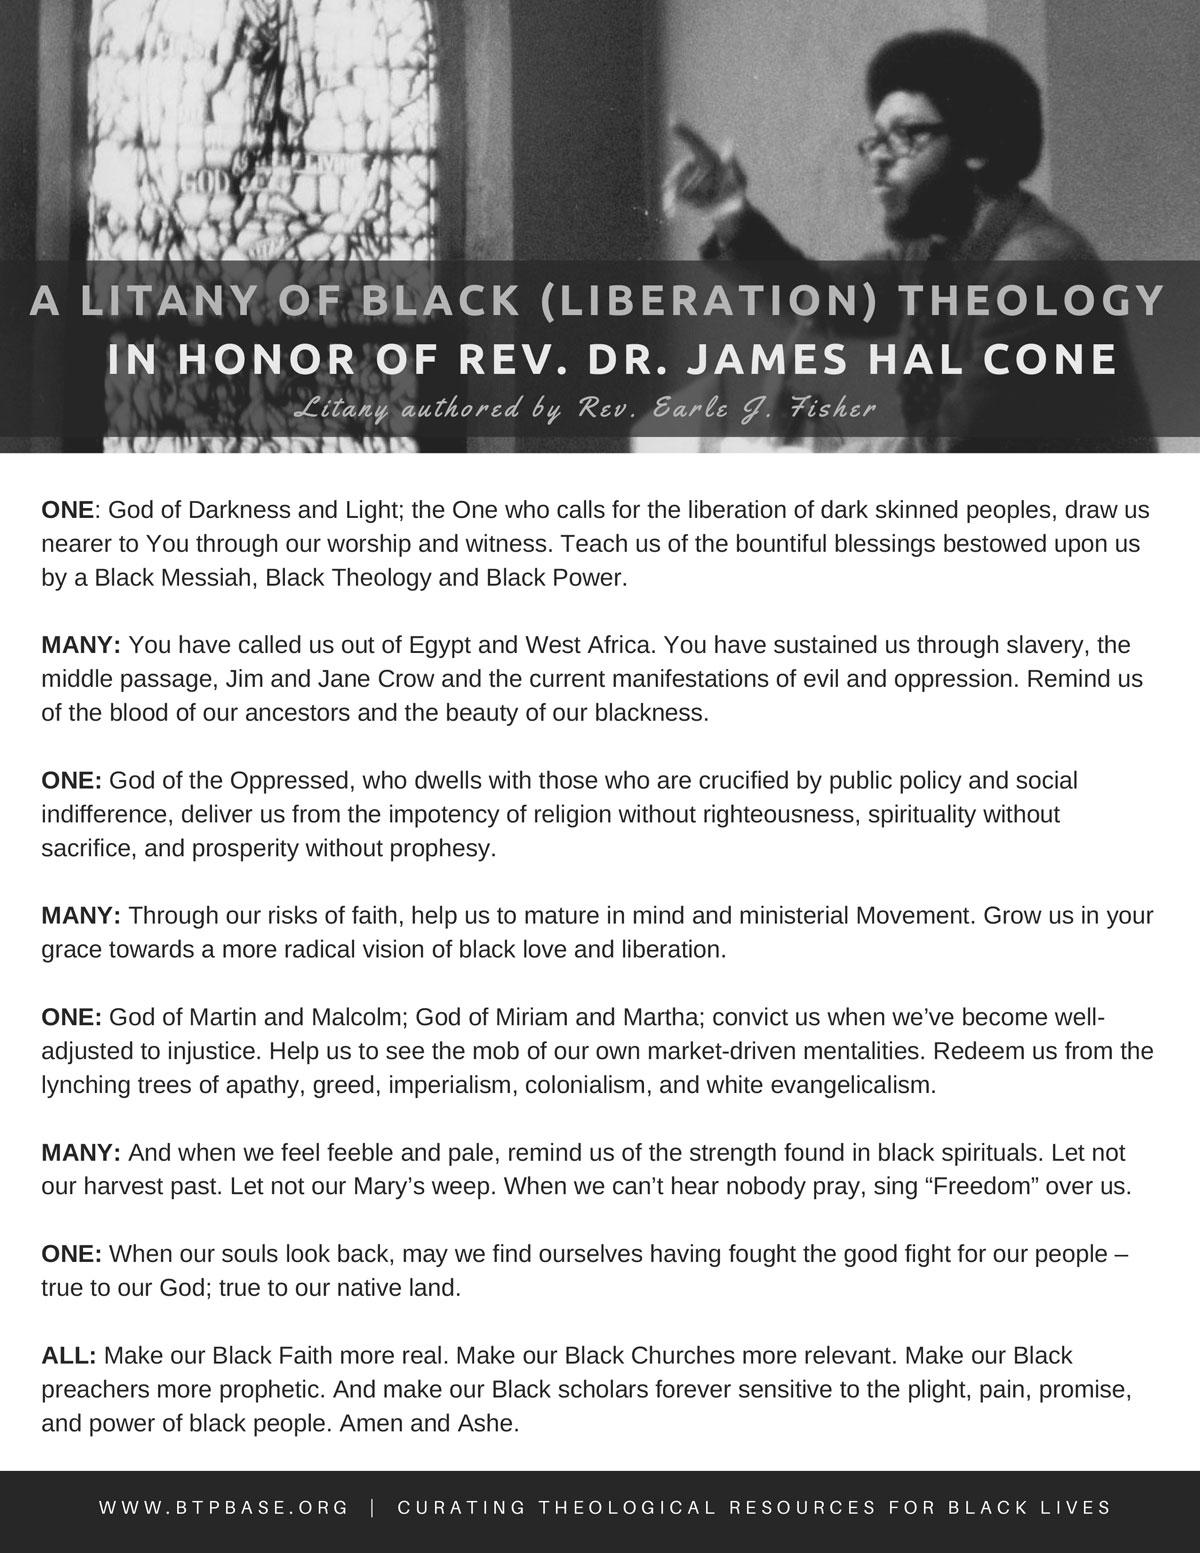 Statement from The Black Catholic Theological Symposium on the